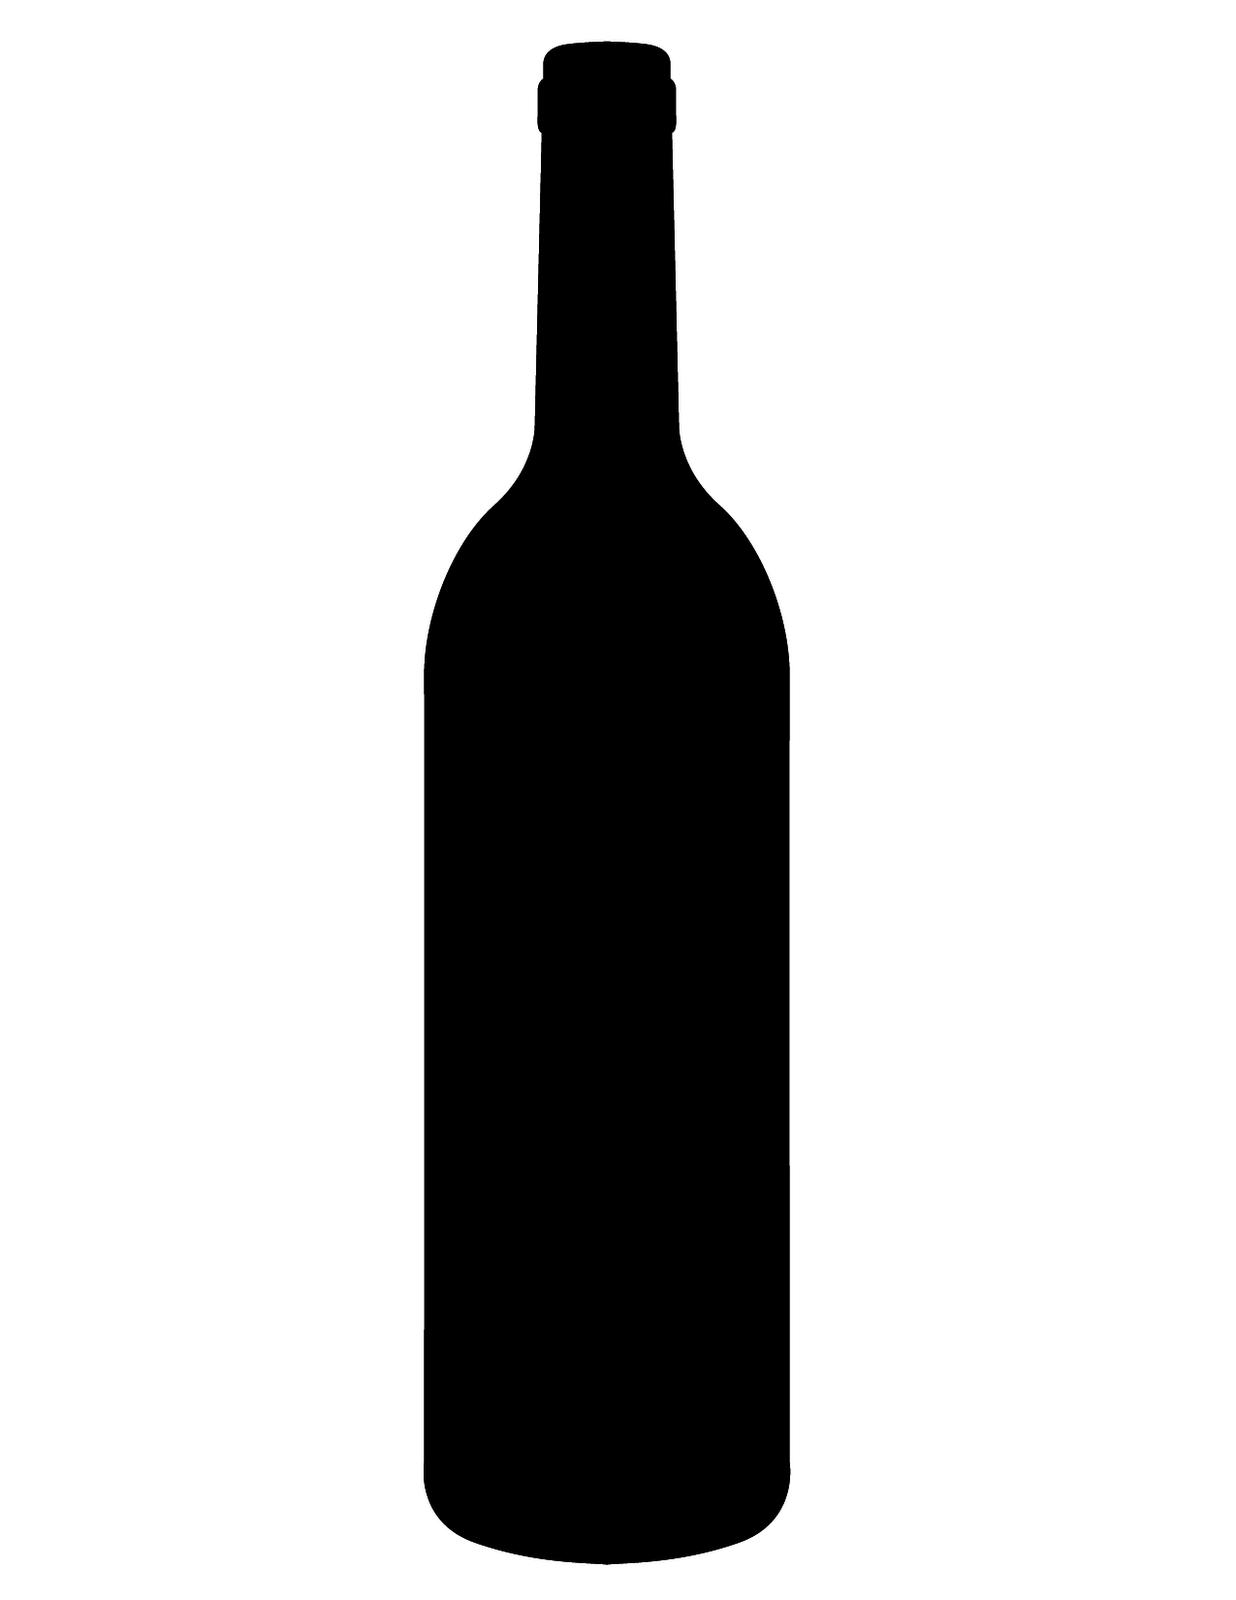 Principles Of Graphic Art Bottles Bottle Wine Bottle Bottles Decoration